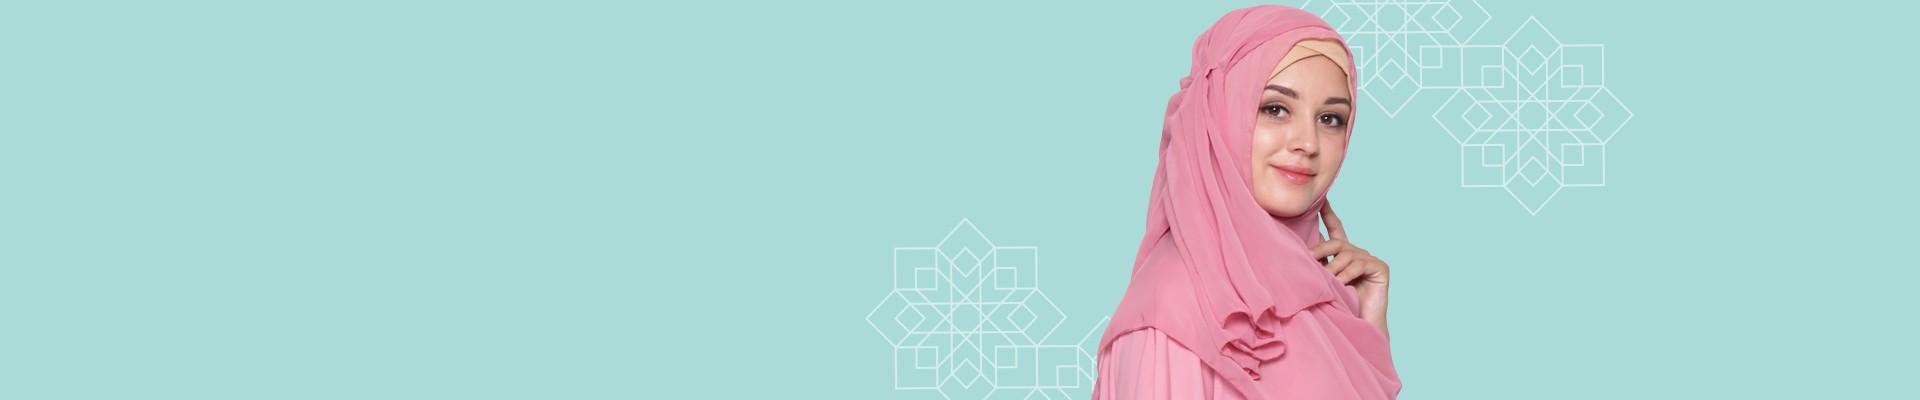 Jual Hijab, Jilbab Instan Model Terbaru, Harga Grosir Murah